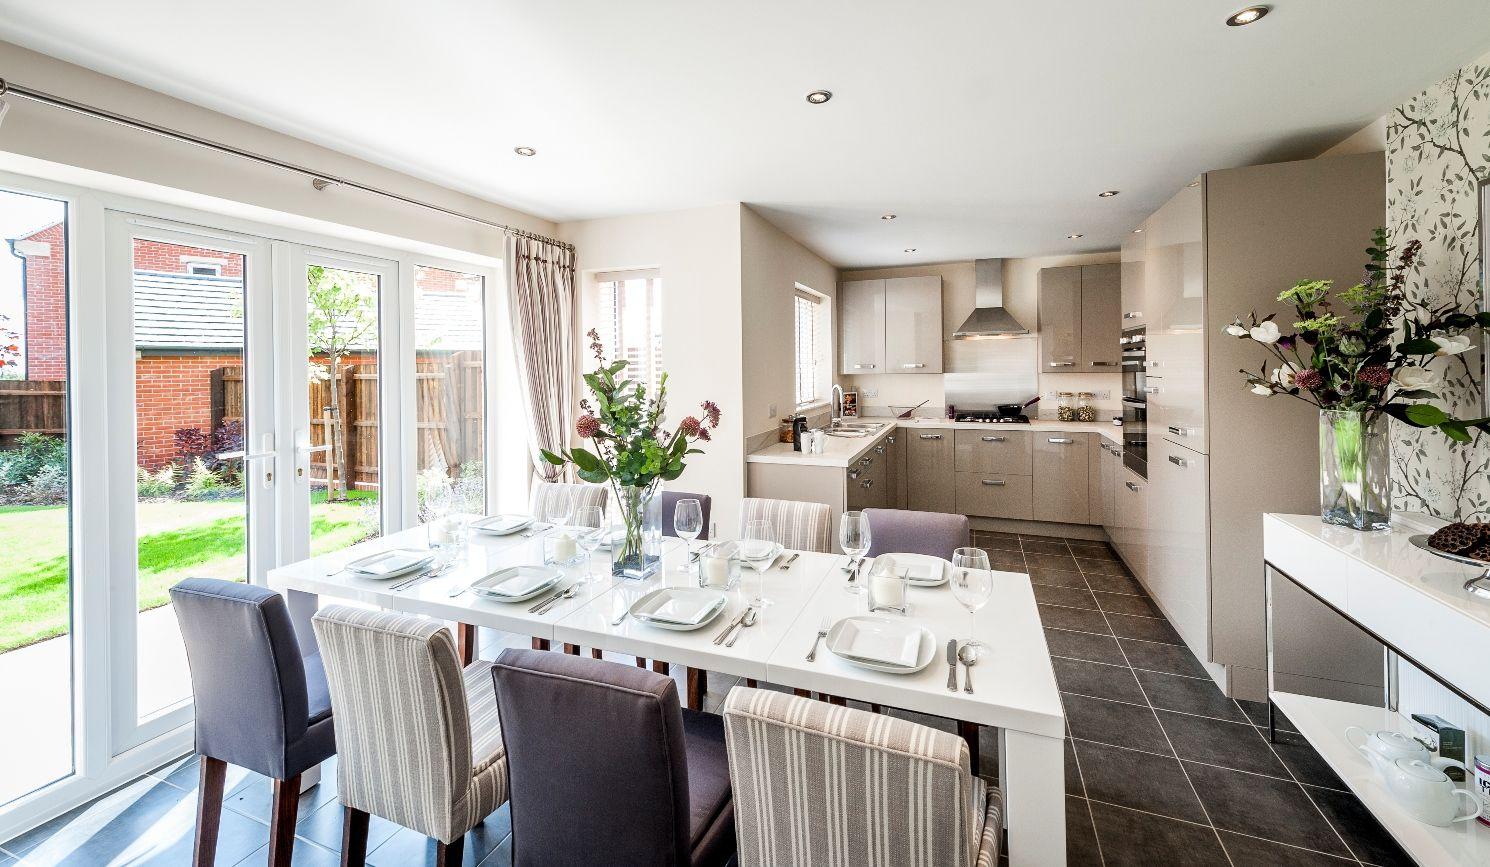 Kitchen Diner Design Layouts Google Search